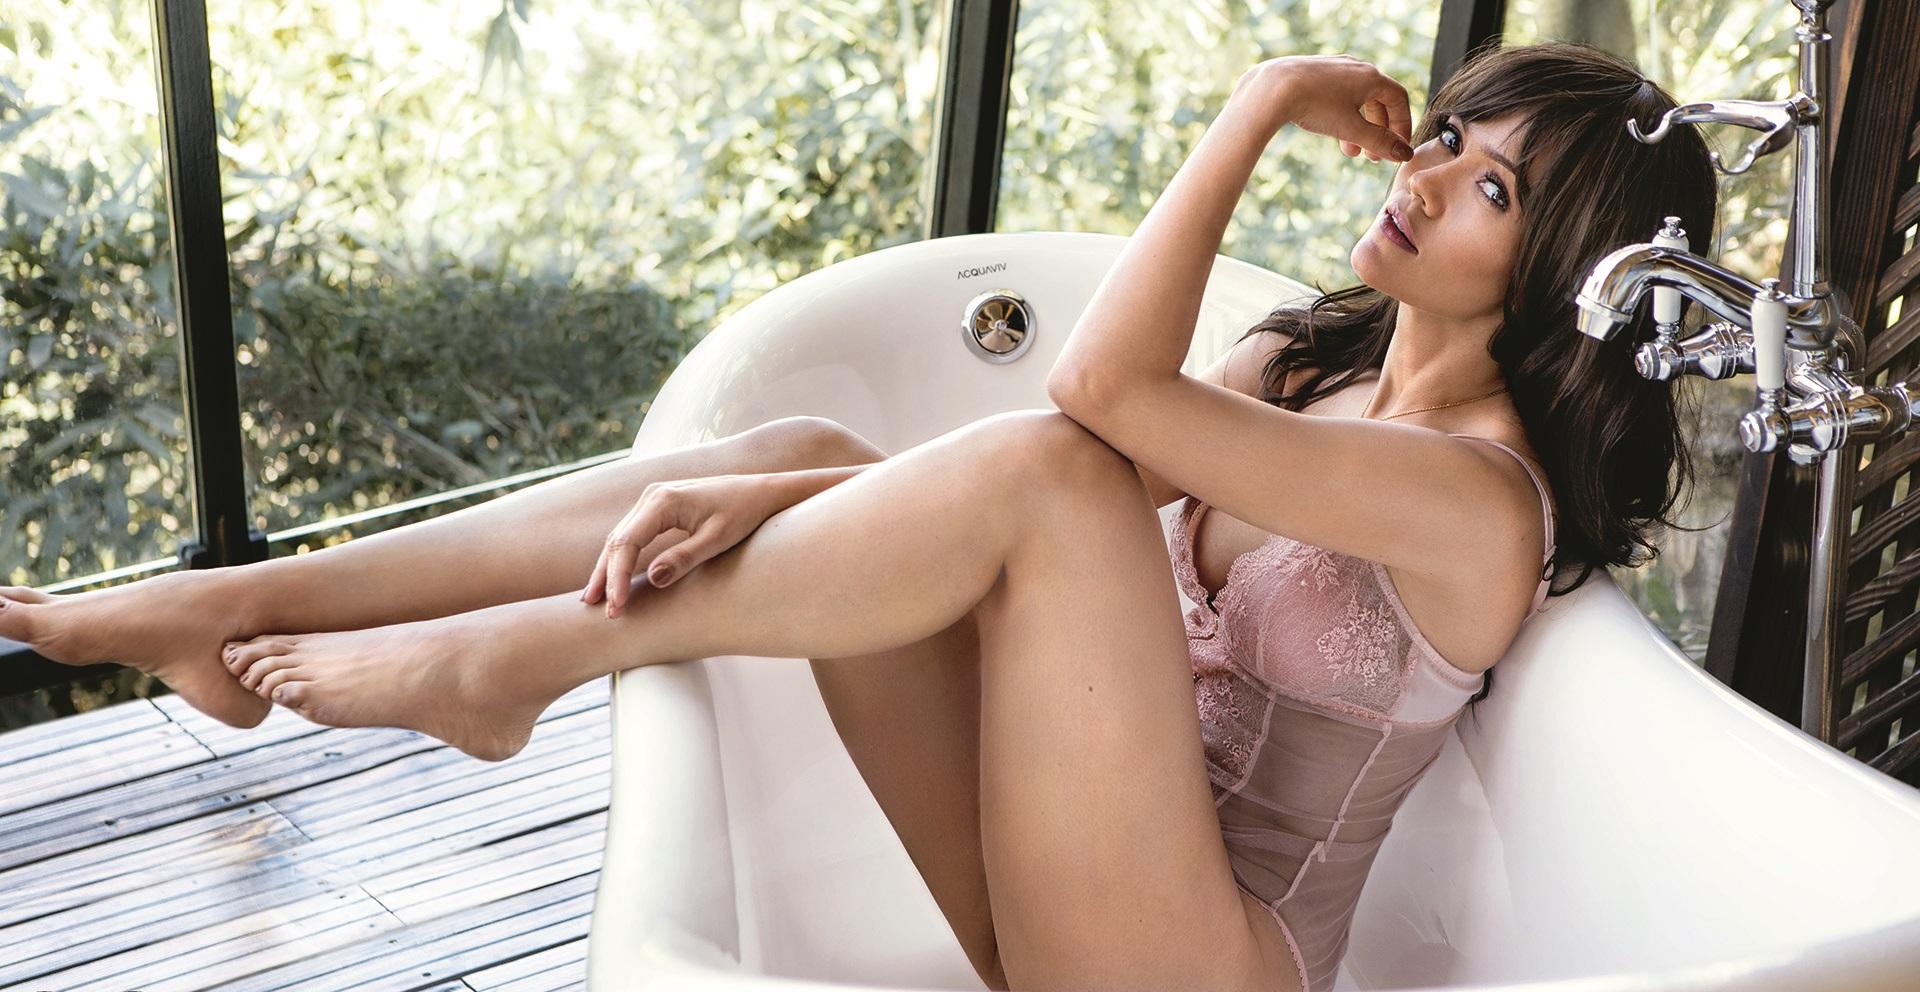 Waluscha De Sousa hot topless image